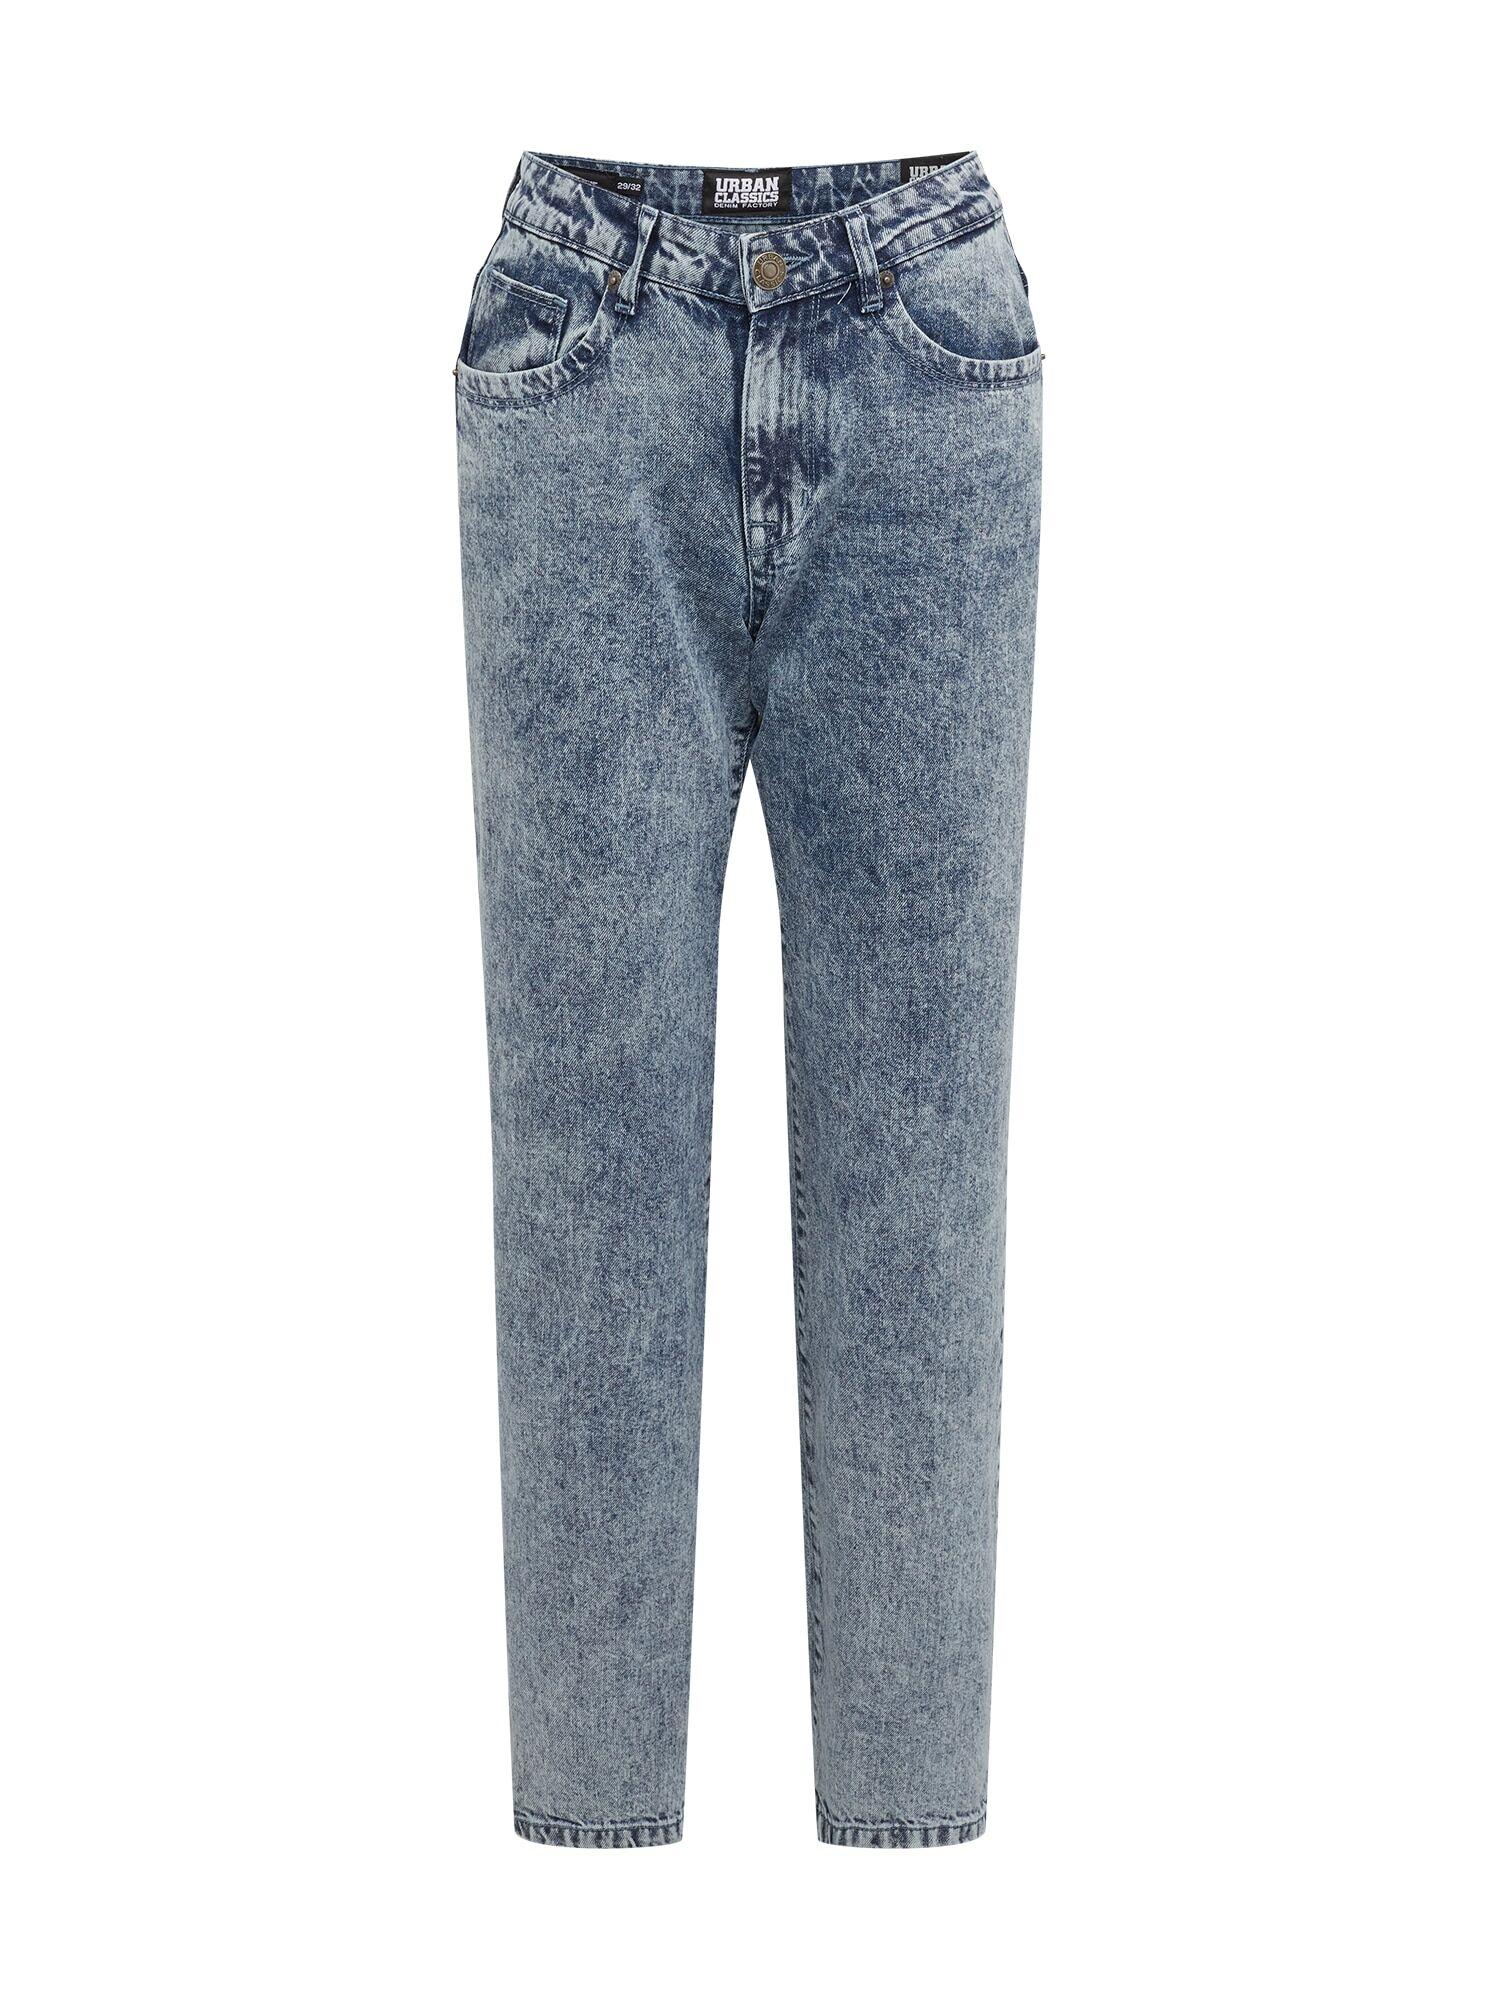 Urban Classics Jean  - Bleu - Taille: 29 - male